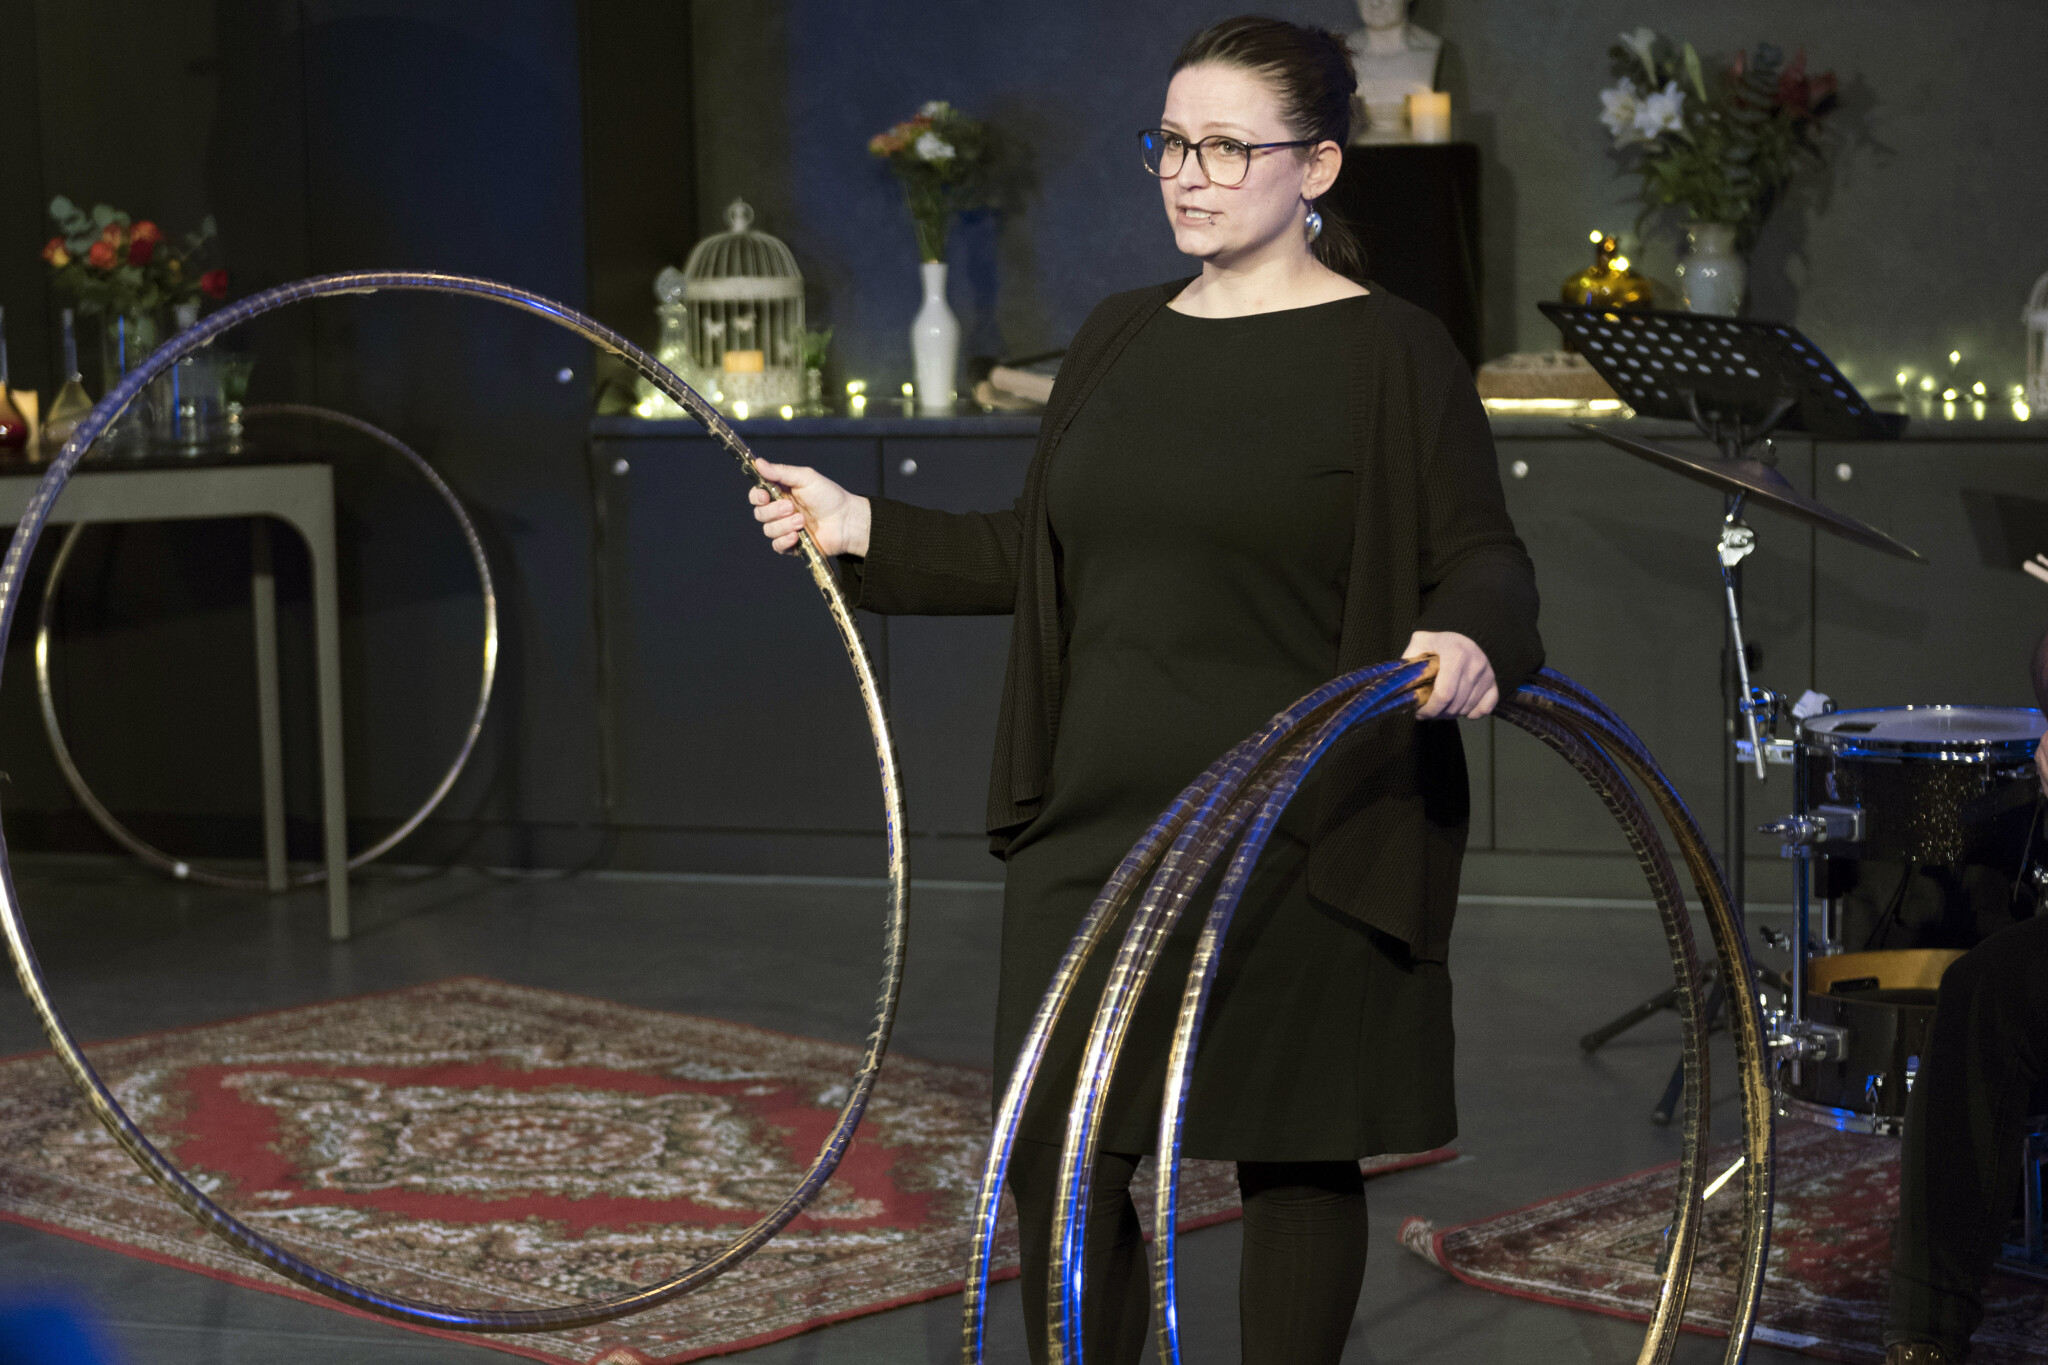 Nora Lentge-Maaß with hula-hoops (2020). Copyright: Hwa-Ja Götz, Museum für Naturkunde Berlin.